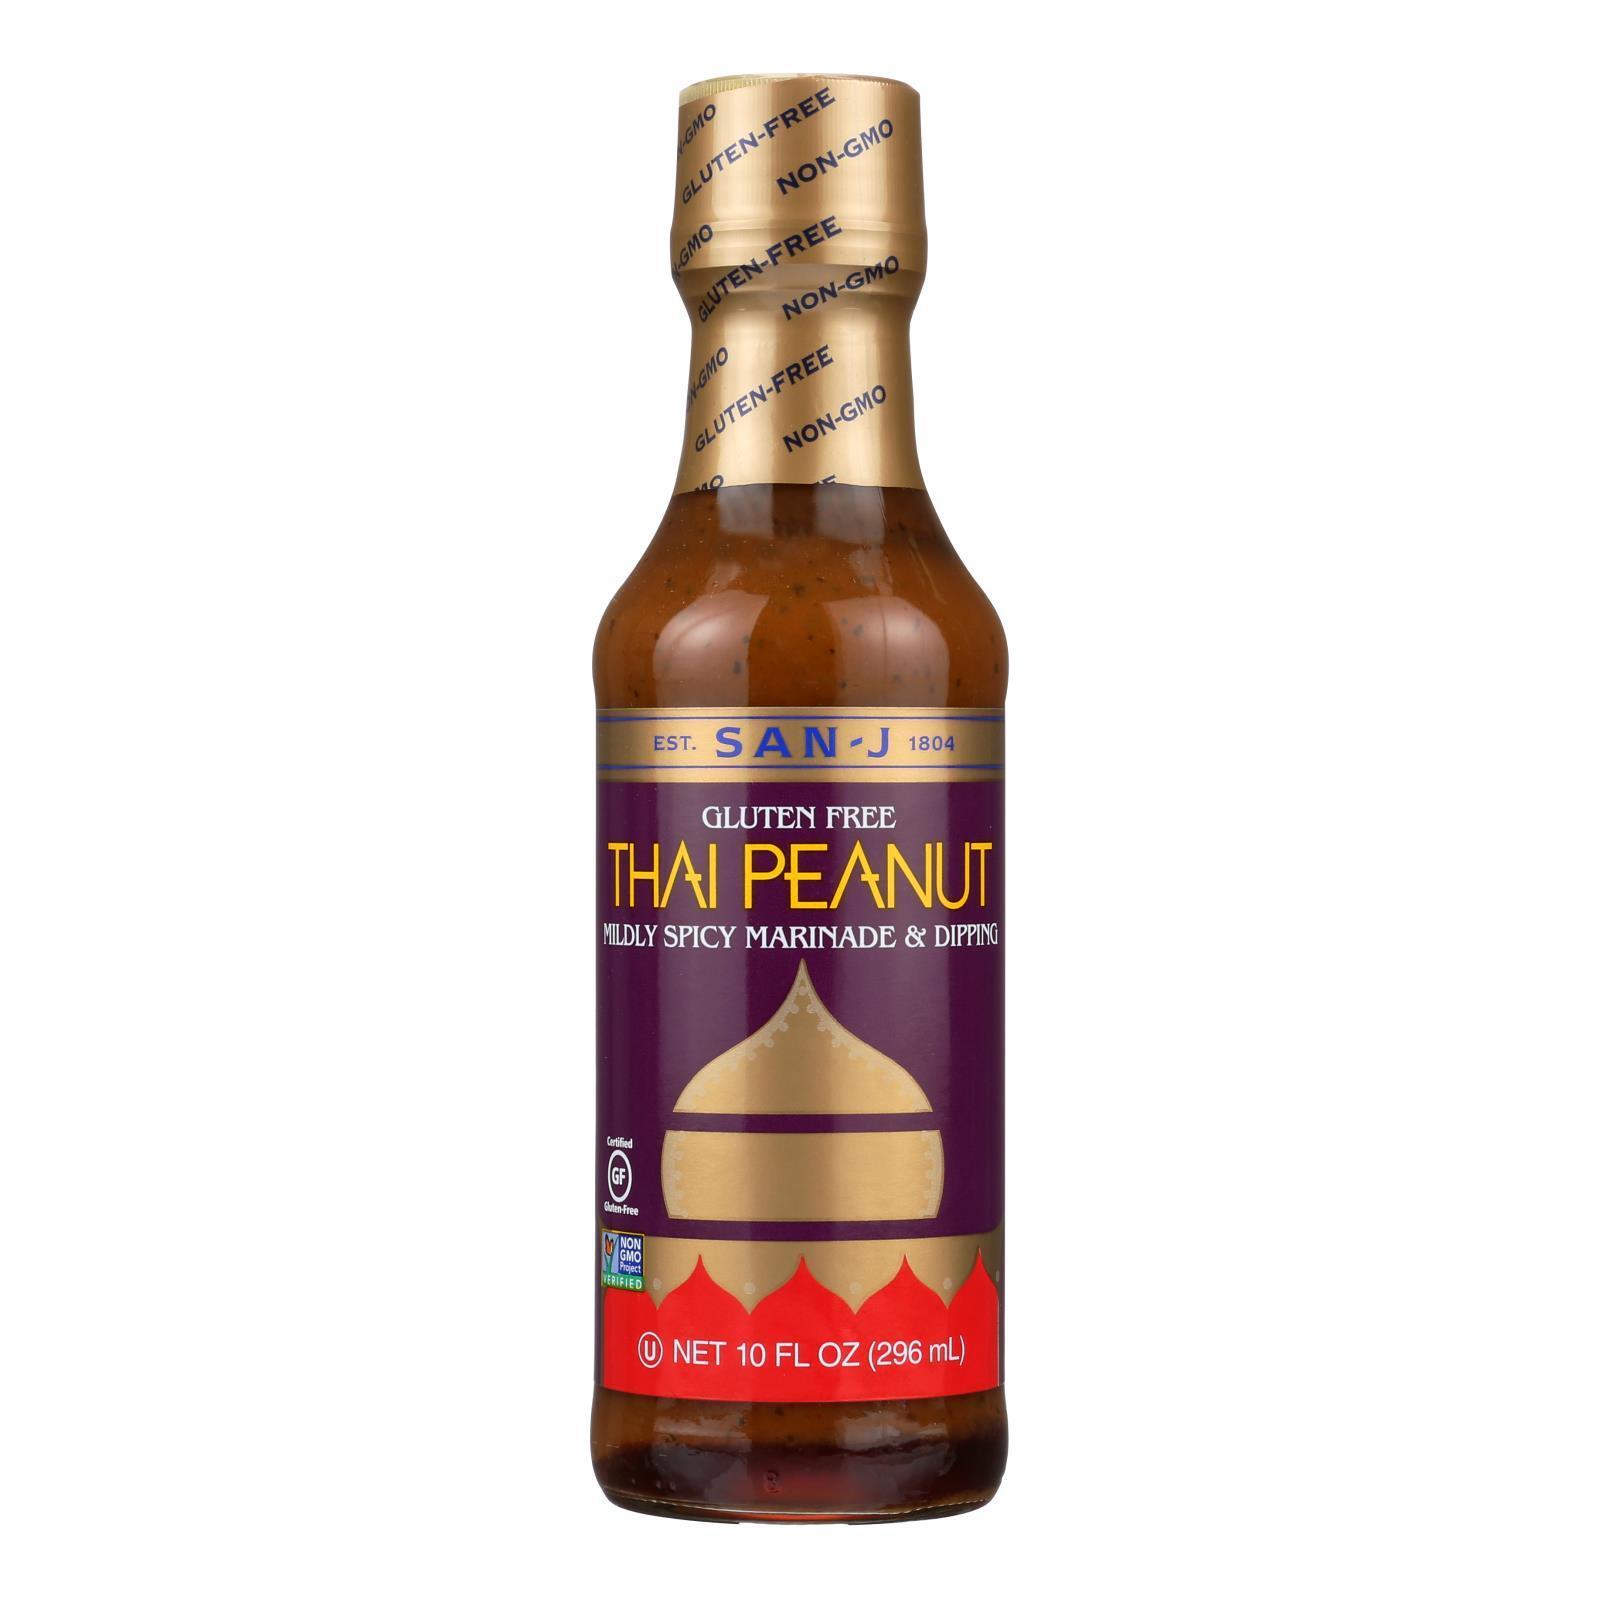 San - J Cooking Sauce - Thai Peanut - Case of 6 - 10 Fl oz.